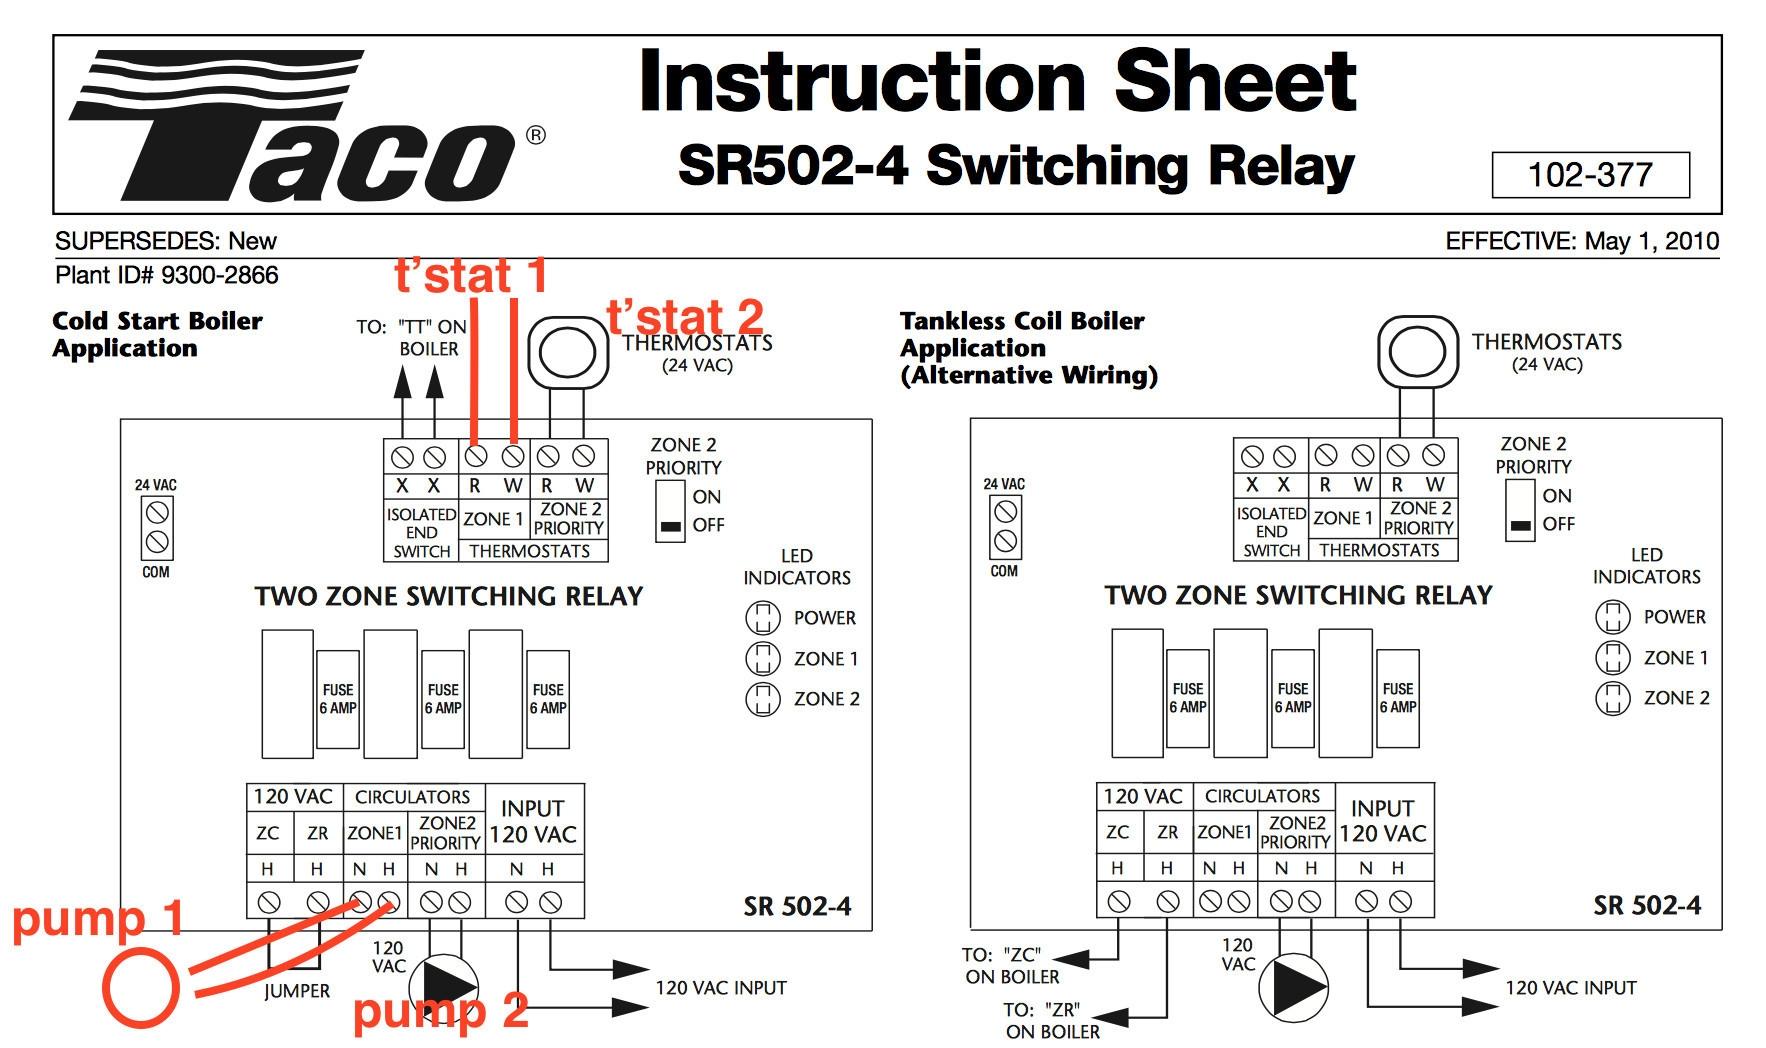 taco cartridge circulator wiring diagram Collection-Wiring Diagram Detail Name taco circulator pump wiring diagram – Taco Valve Wiring Diagram Lenito 15-m